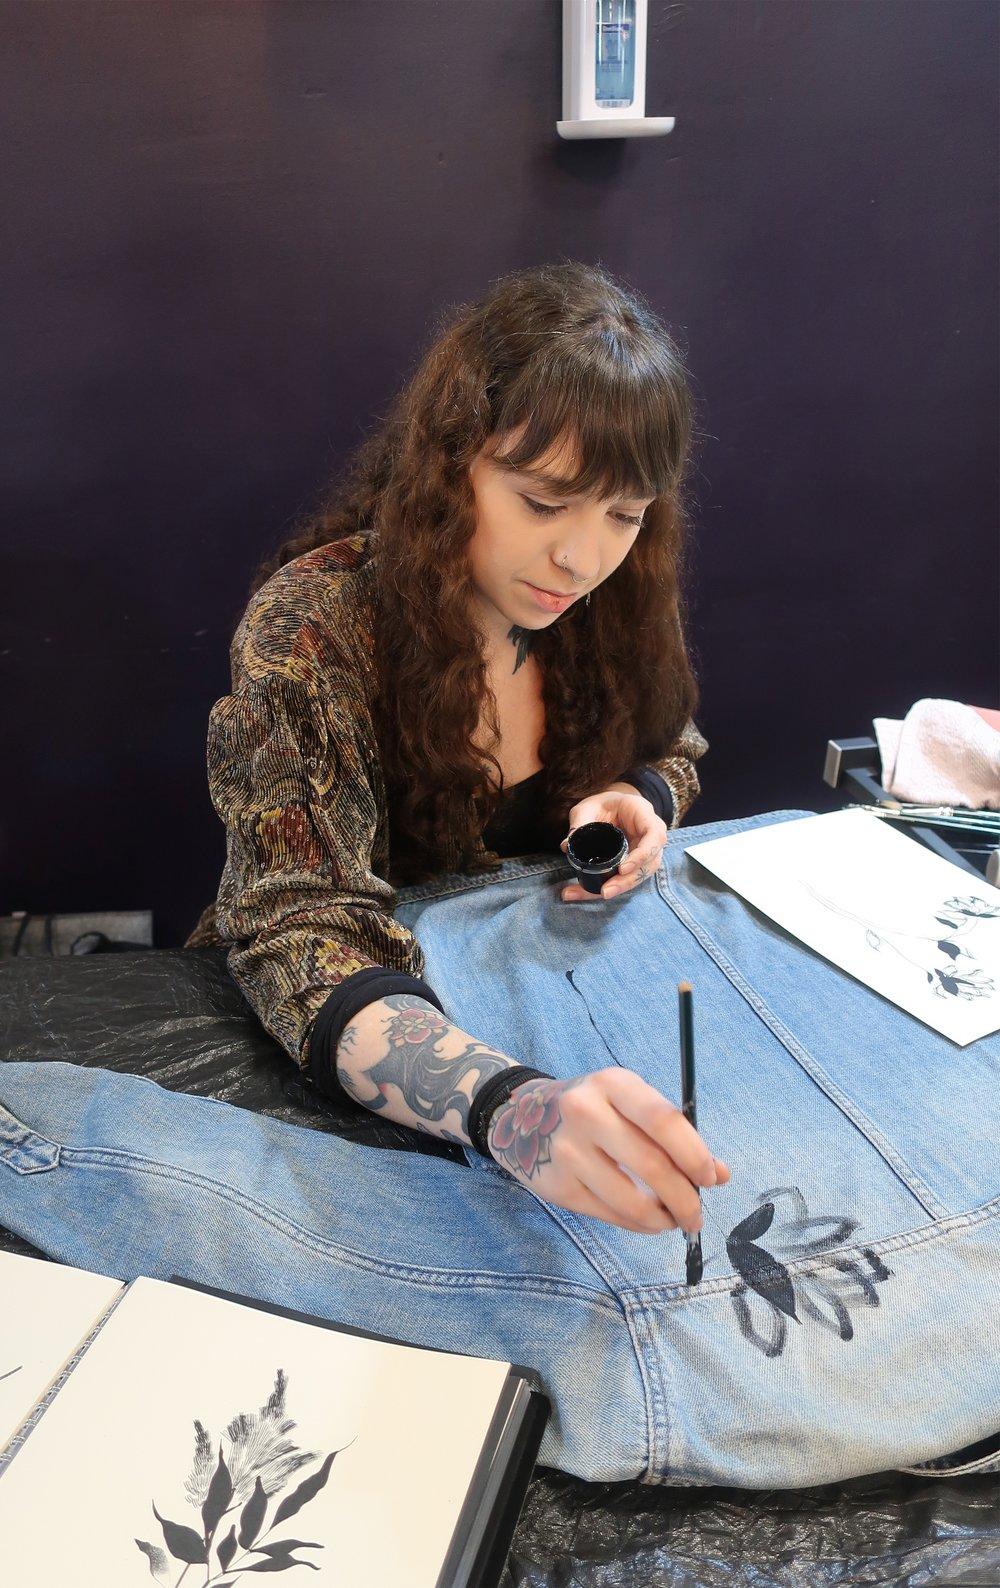 Artist Alba Rey handpainting on denim.jpeg